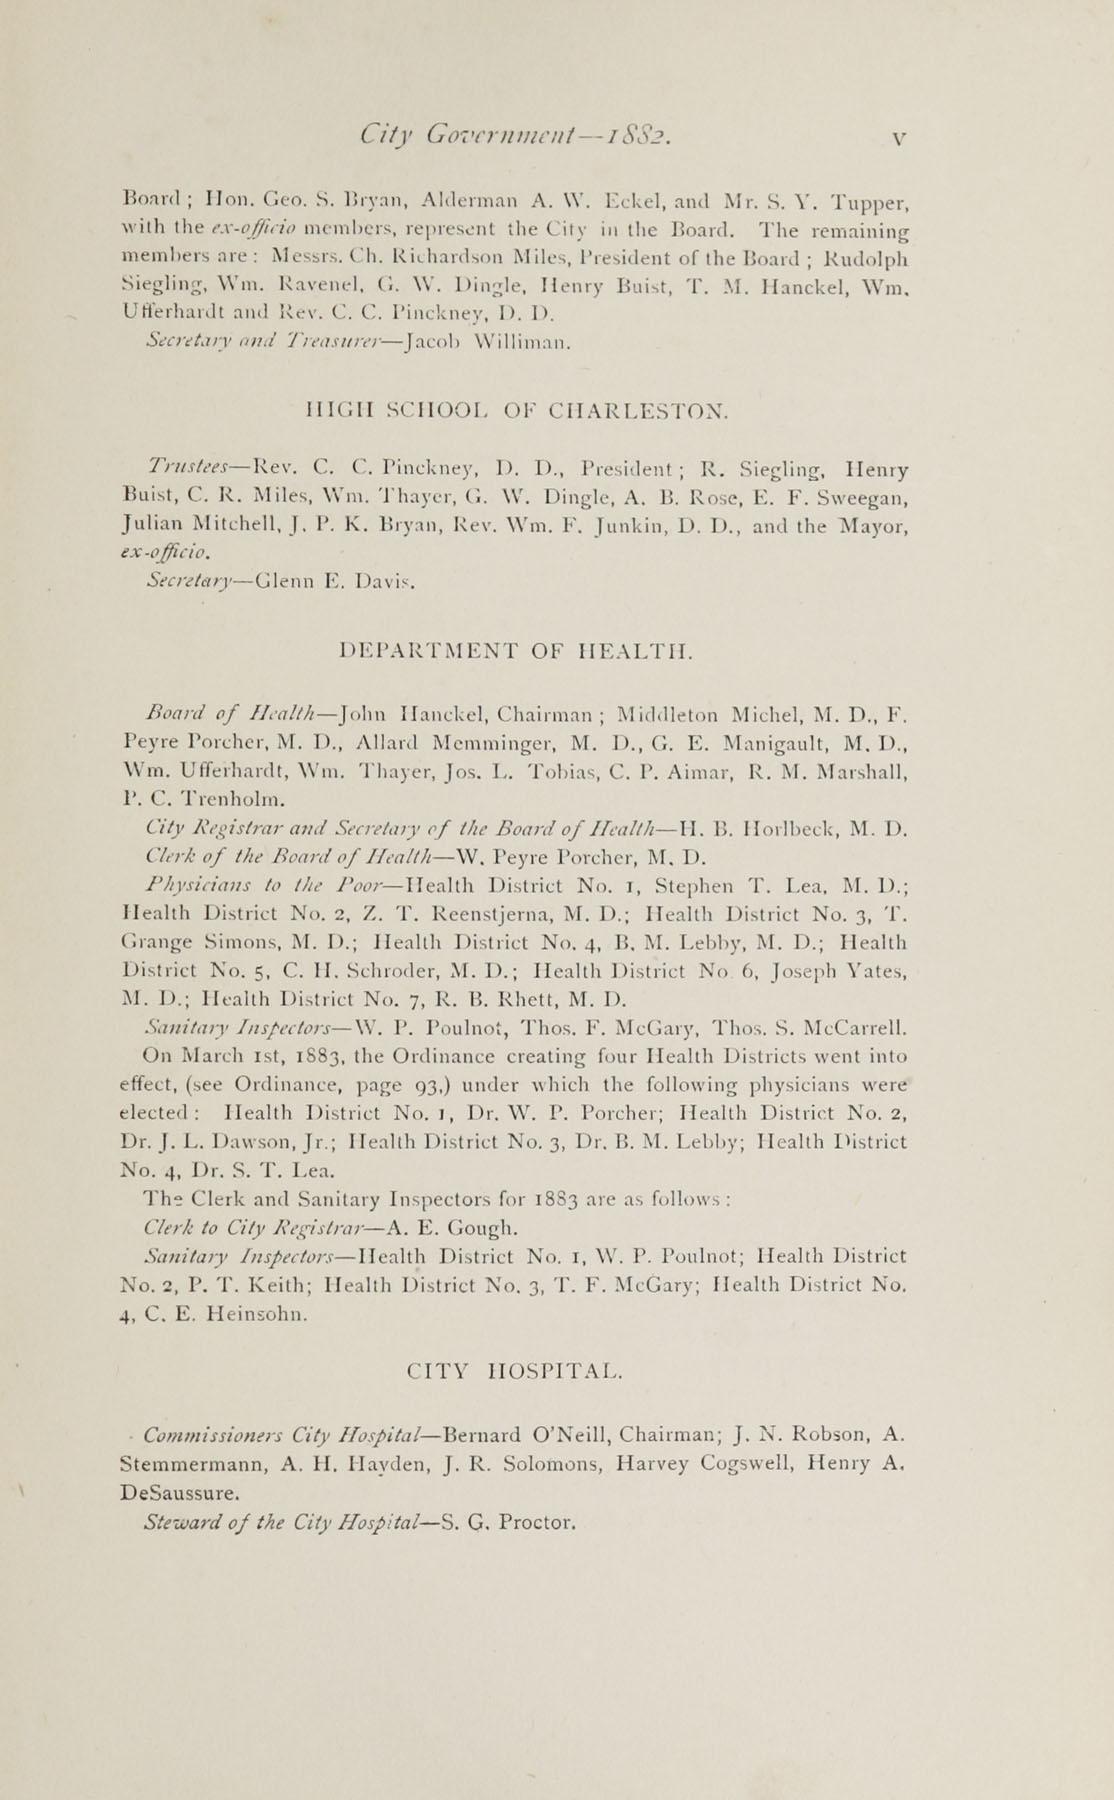 Charleston Yearbook, 1882, page v